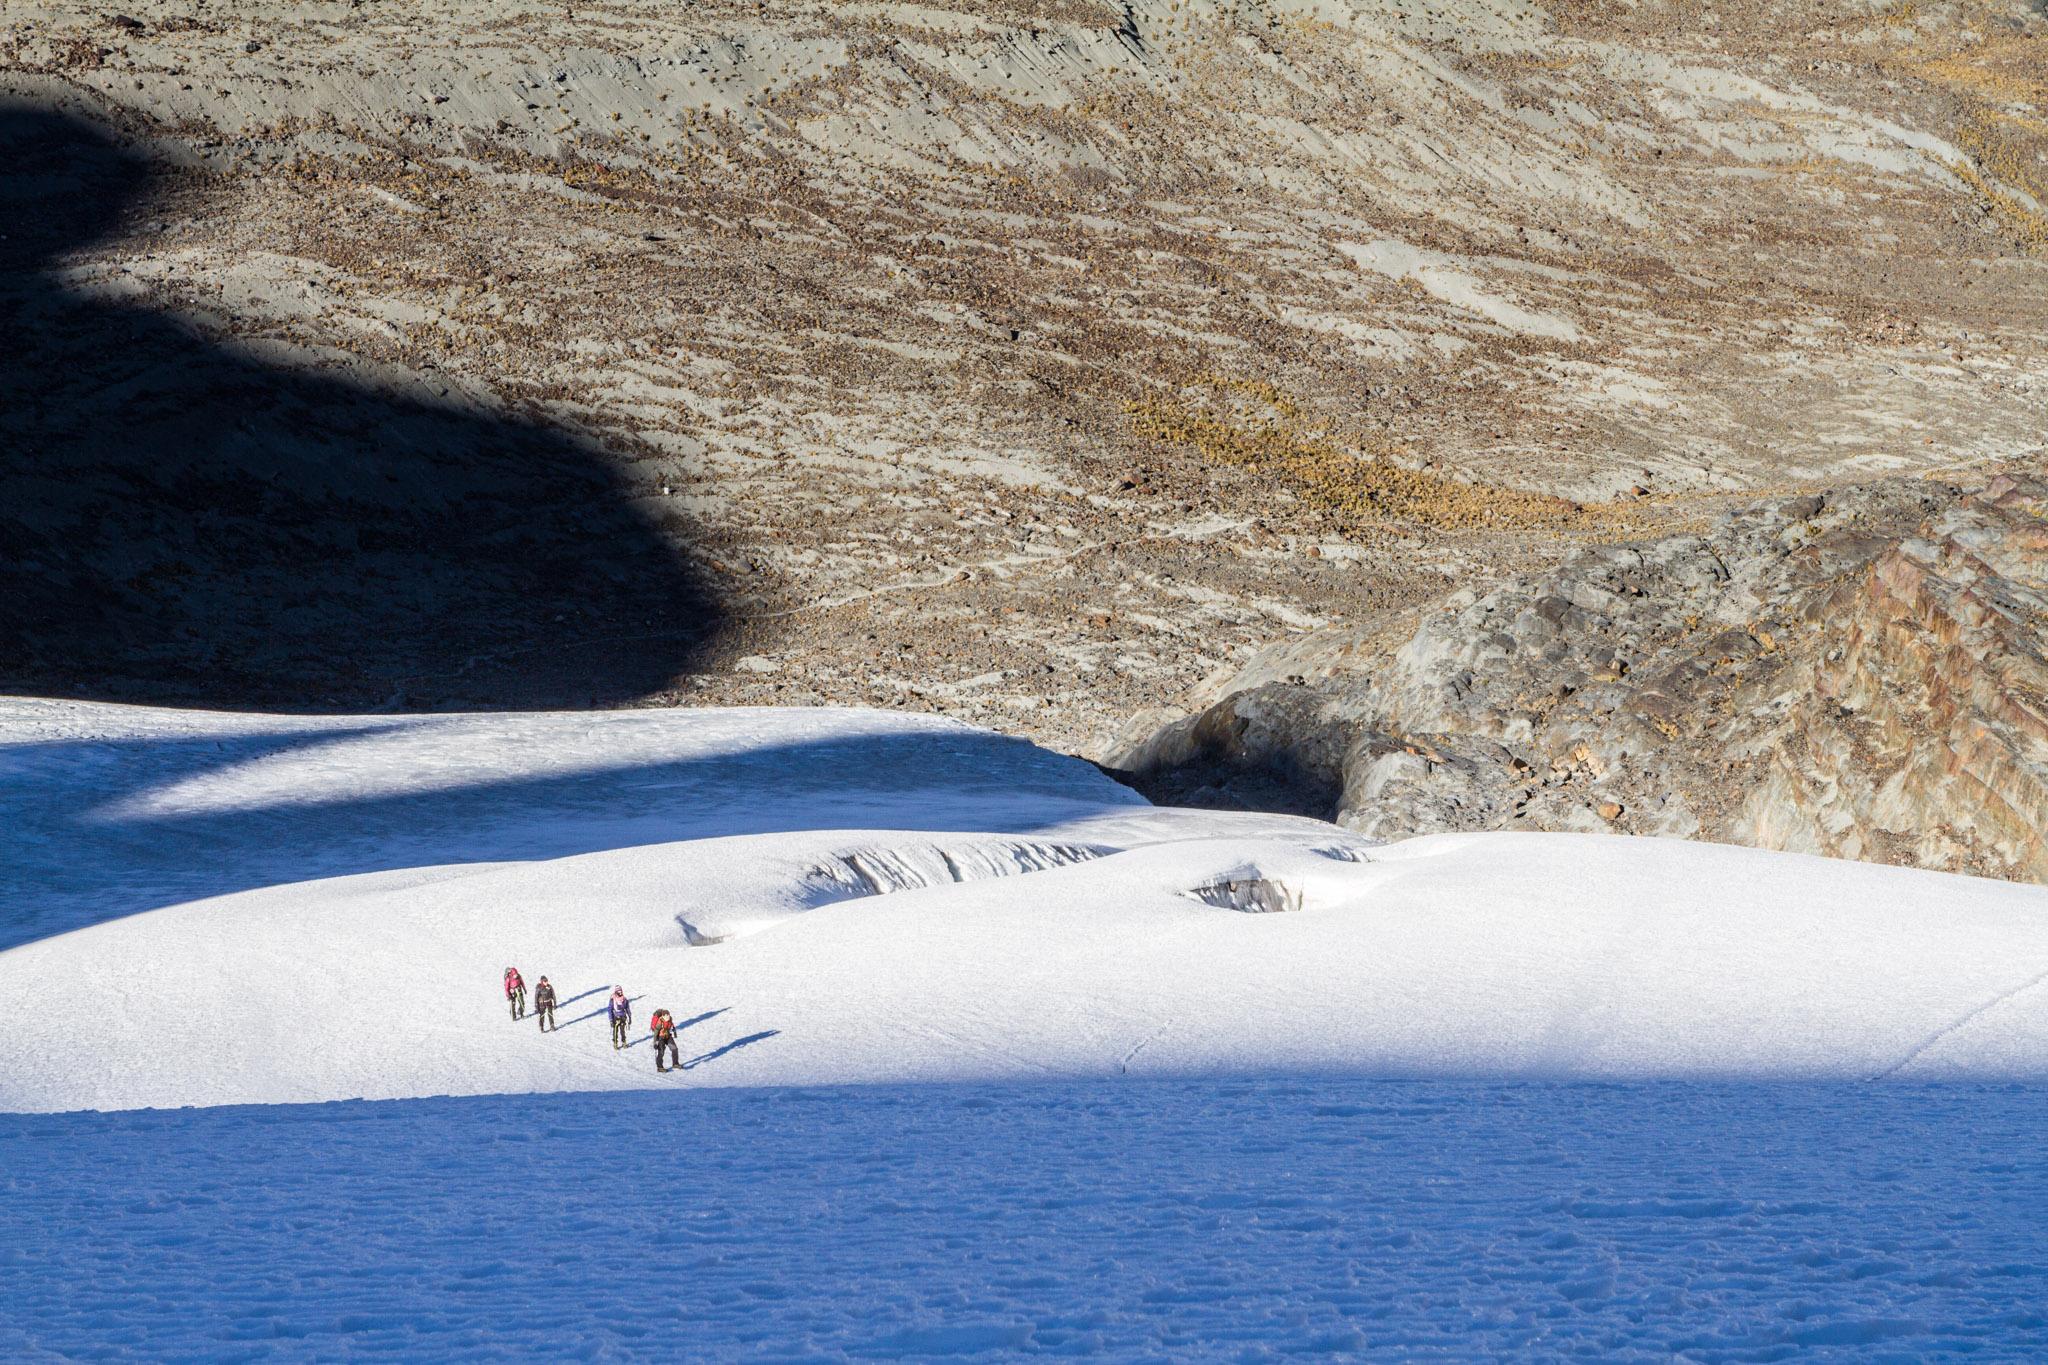 Ali-Barqawi-Studios-Explore-Series-Travel-Adventure-Documentary-C4CGAZA-Bolivia-Mount-Tarija-2015-161.jpg